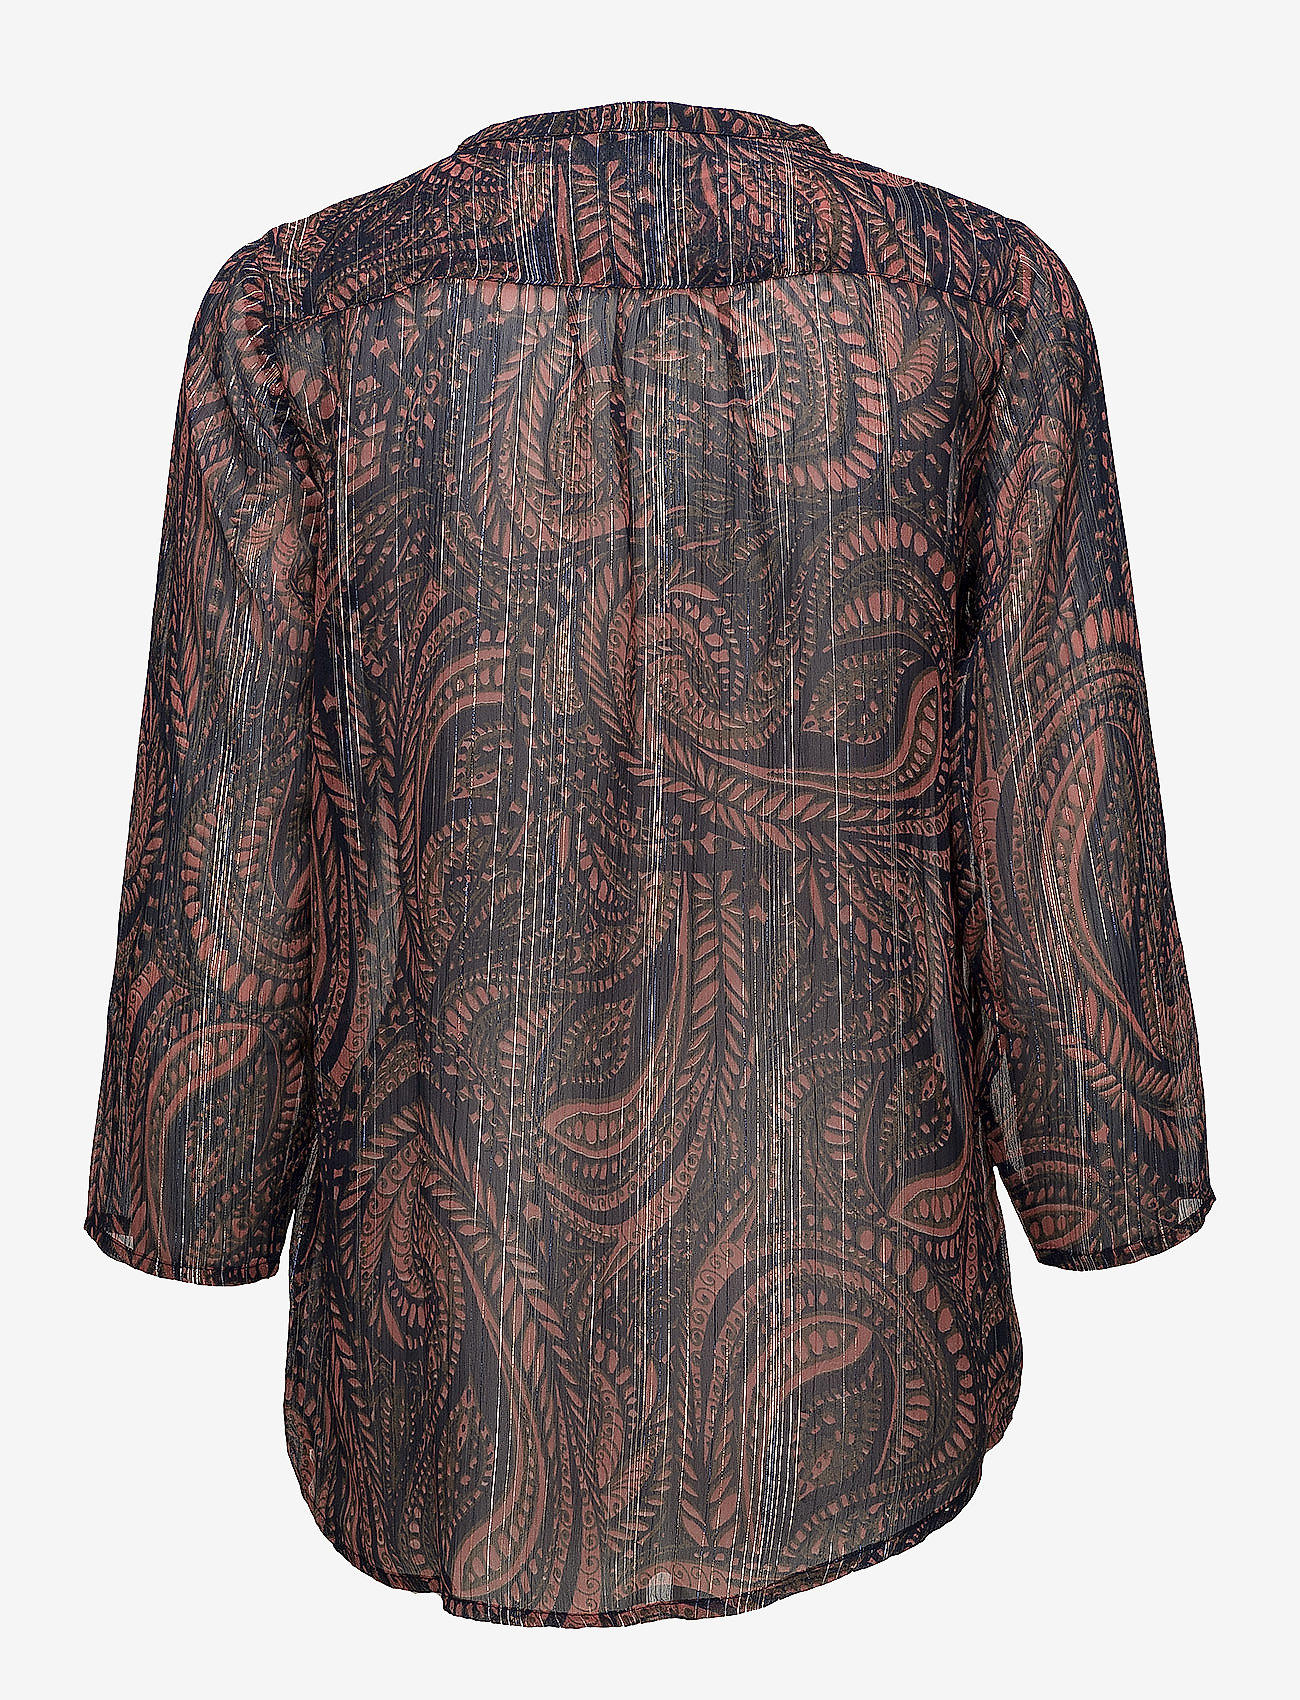 Saint Tropez - PAISLEY PRINT CHIFFON BLOUSE - blouses à manches longues - lantana